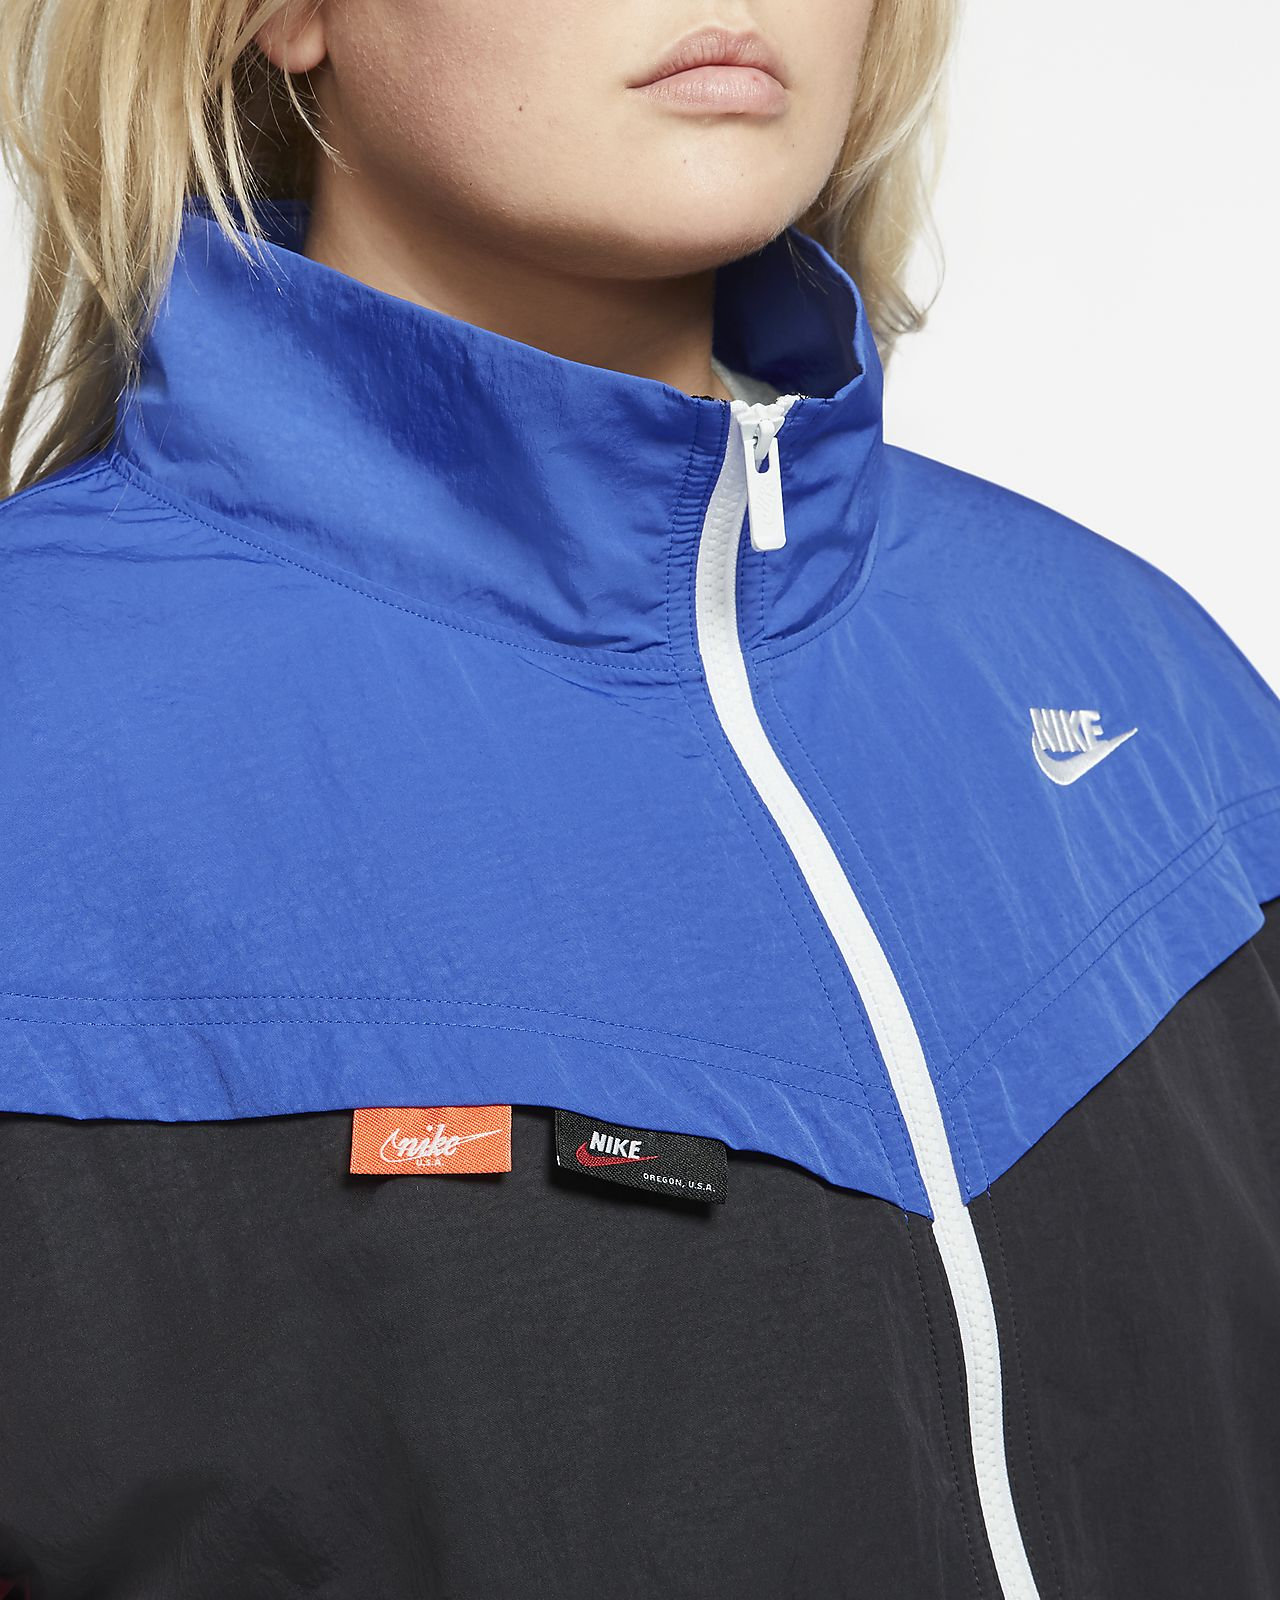 Veste Nike femme taille 38